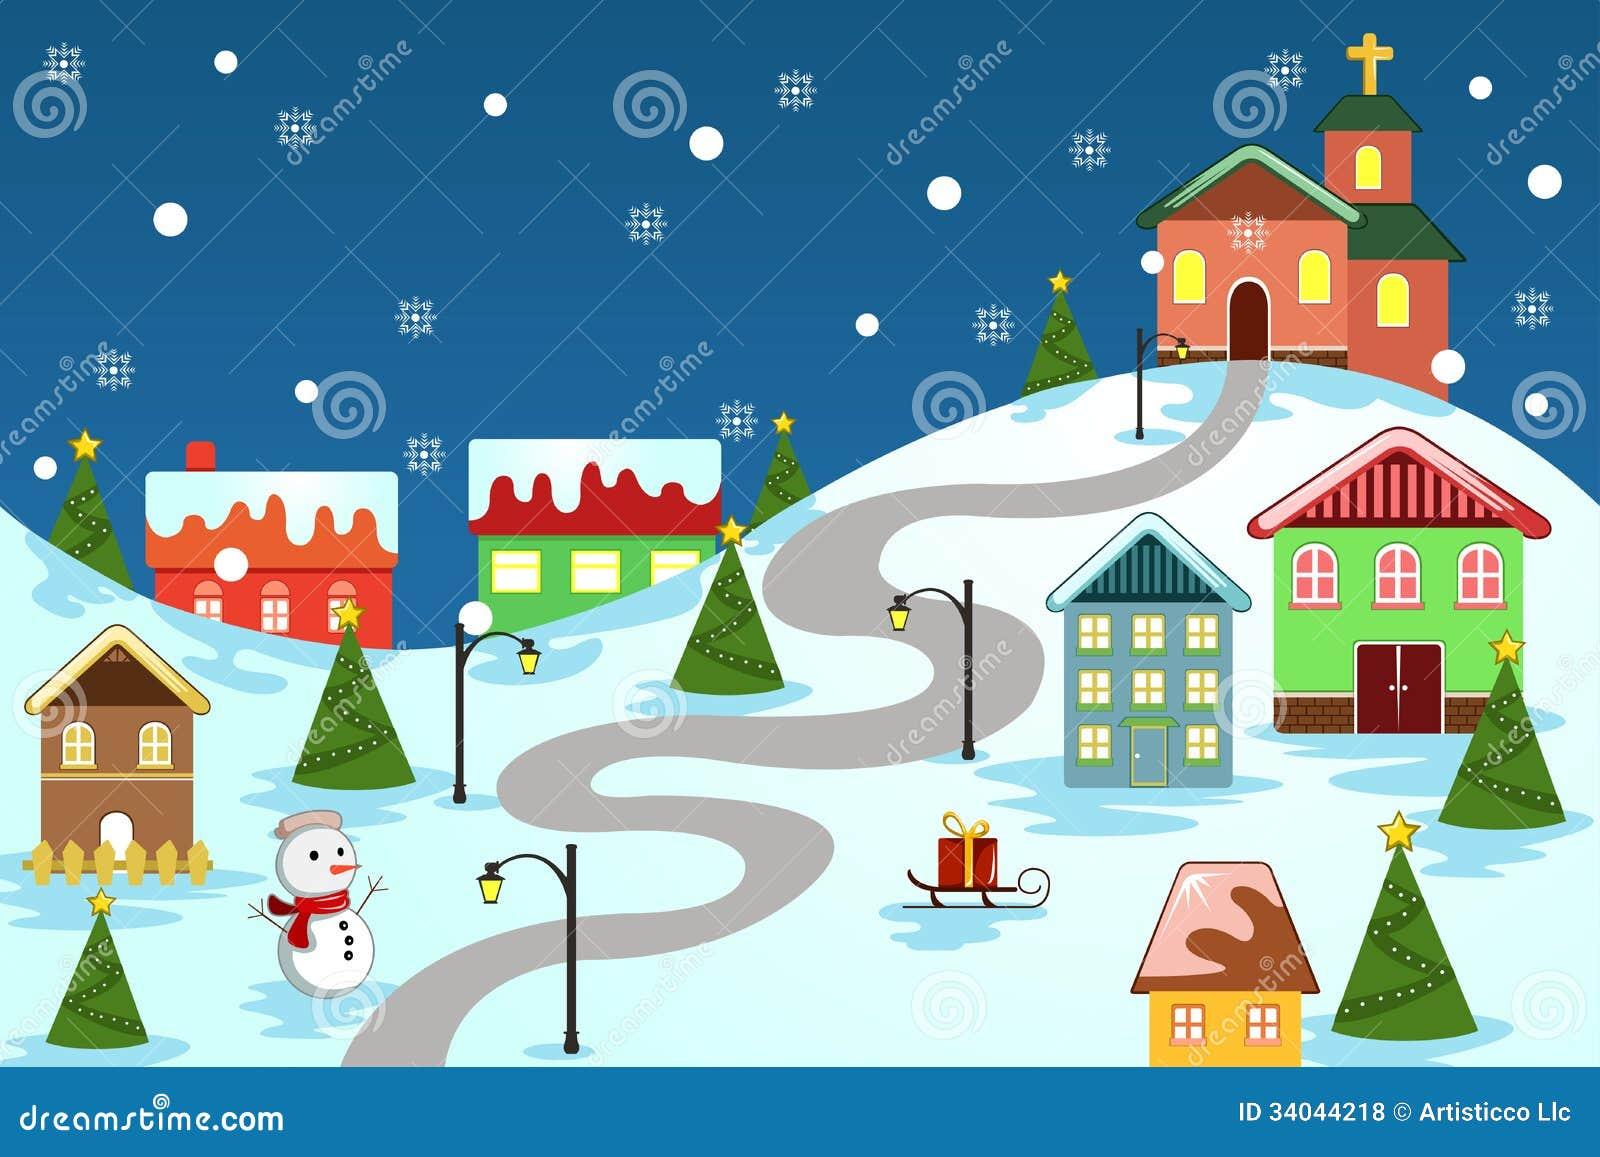 free christmas village clipart - photo #4